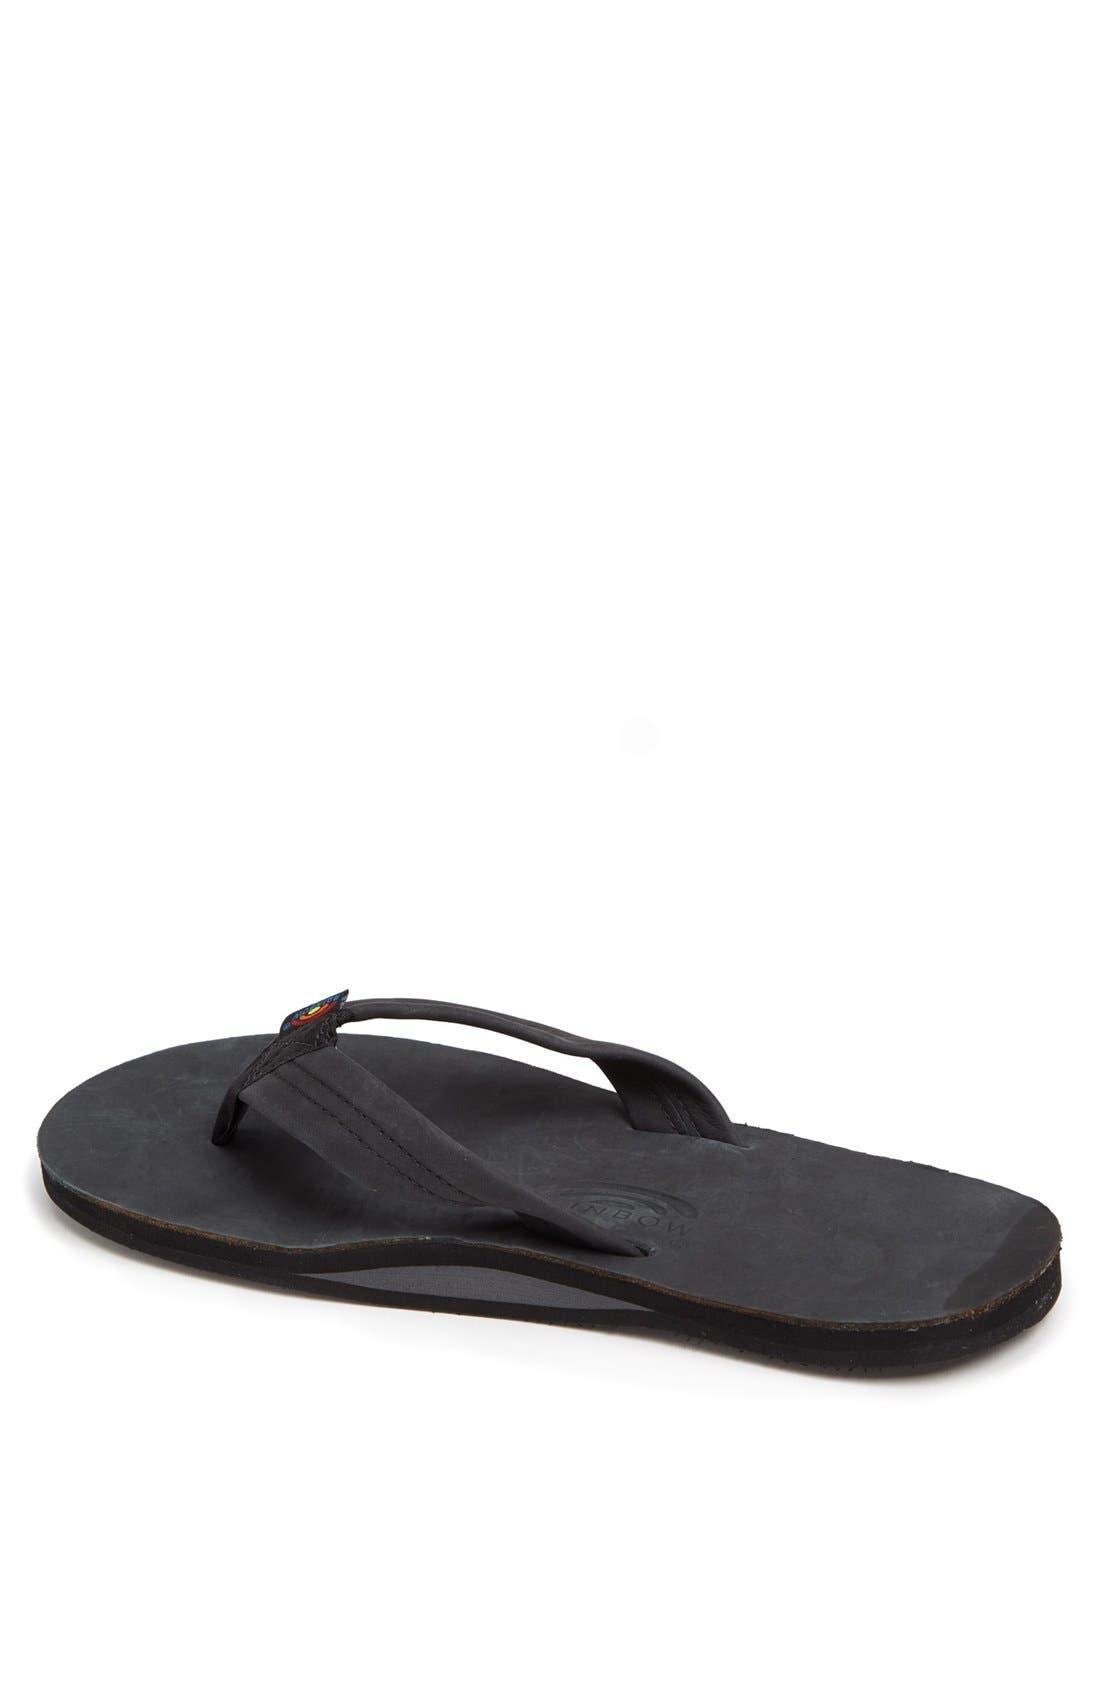 '301Alts' Sandal,                             Alternate thumbnail 2, color,                             BLACK